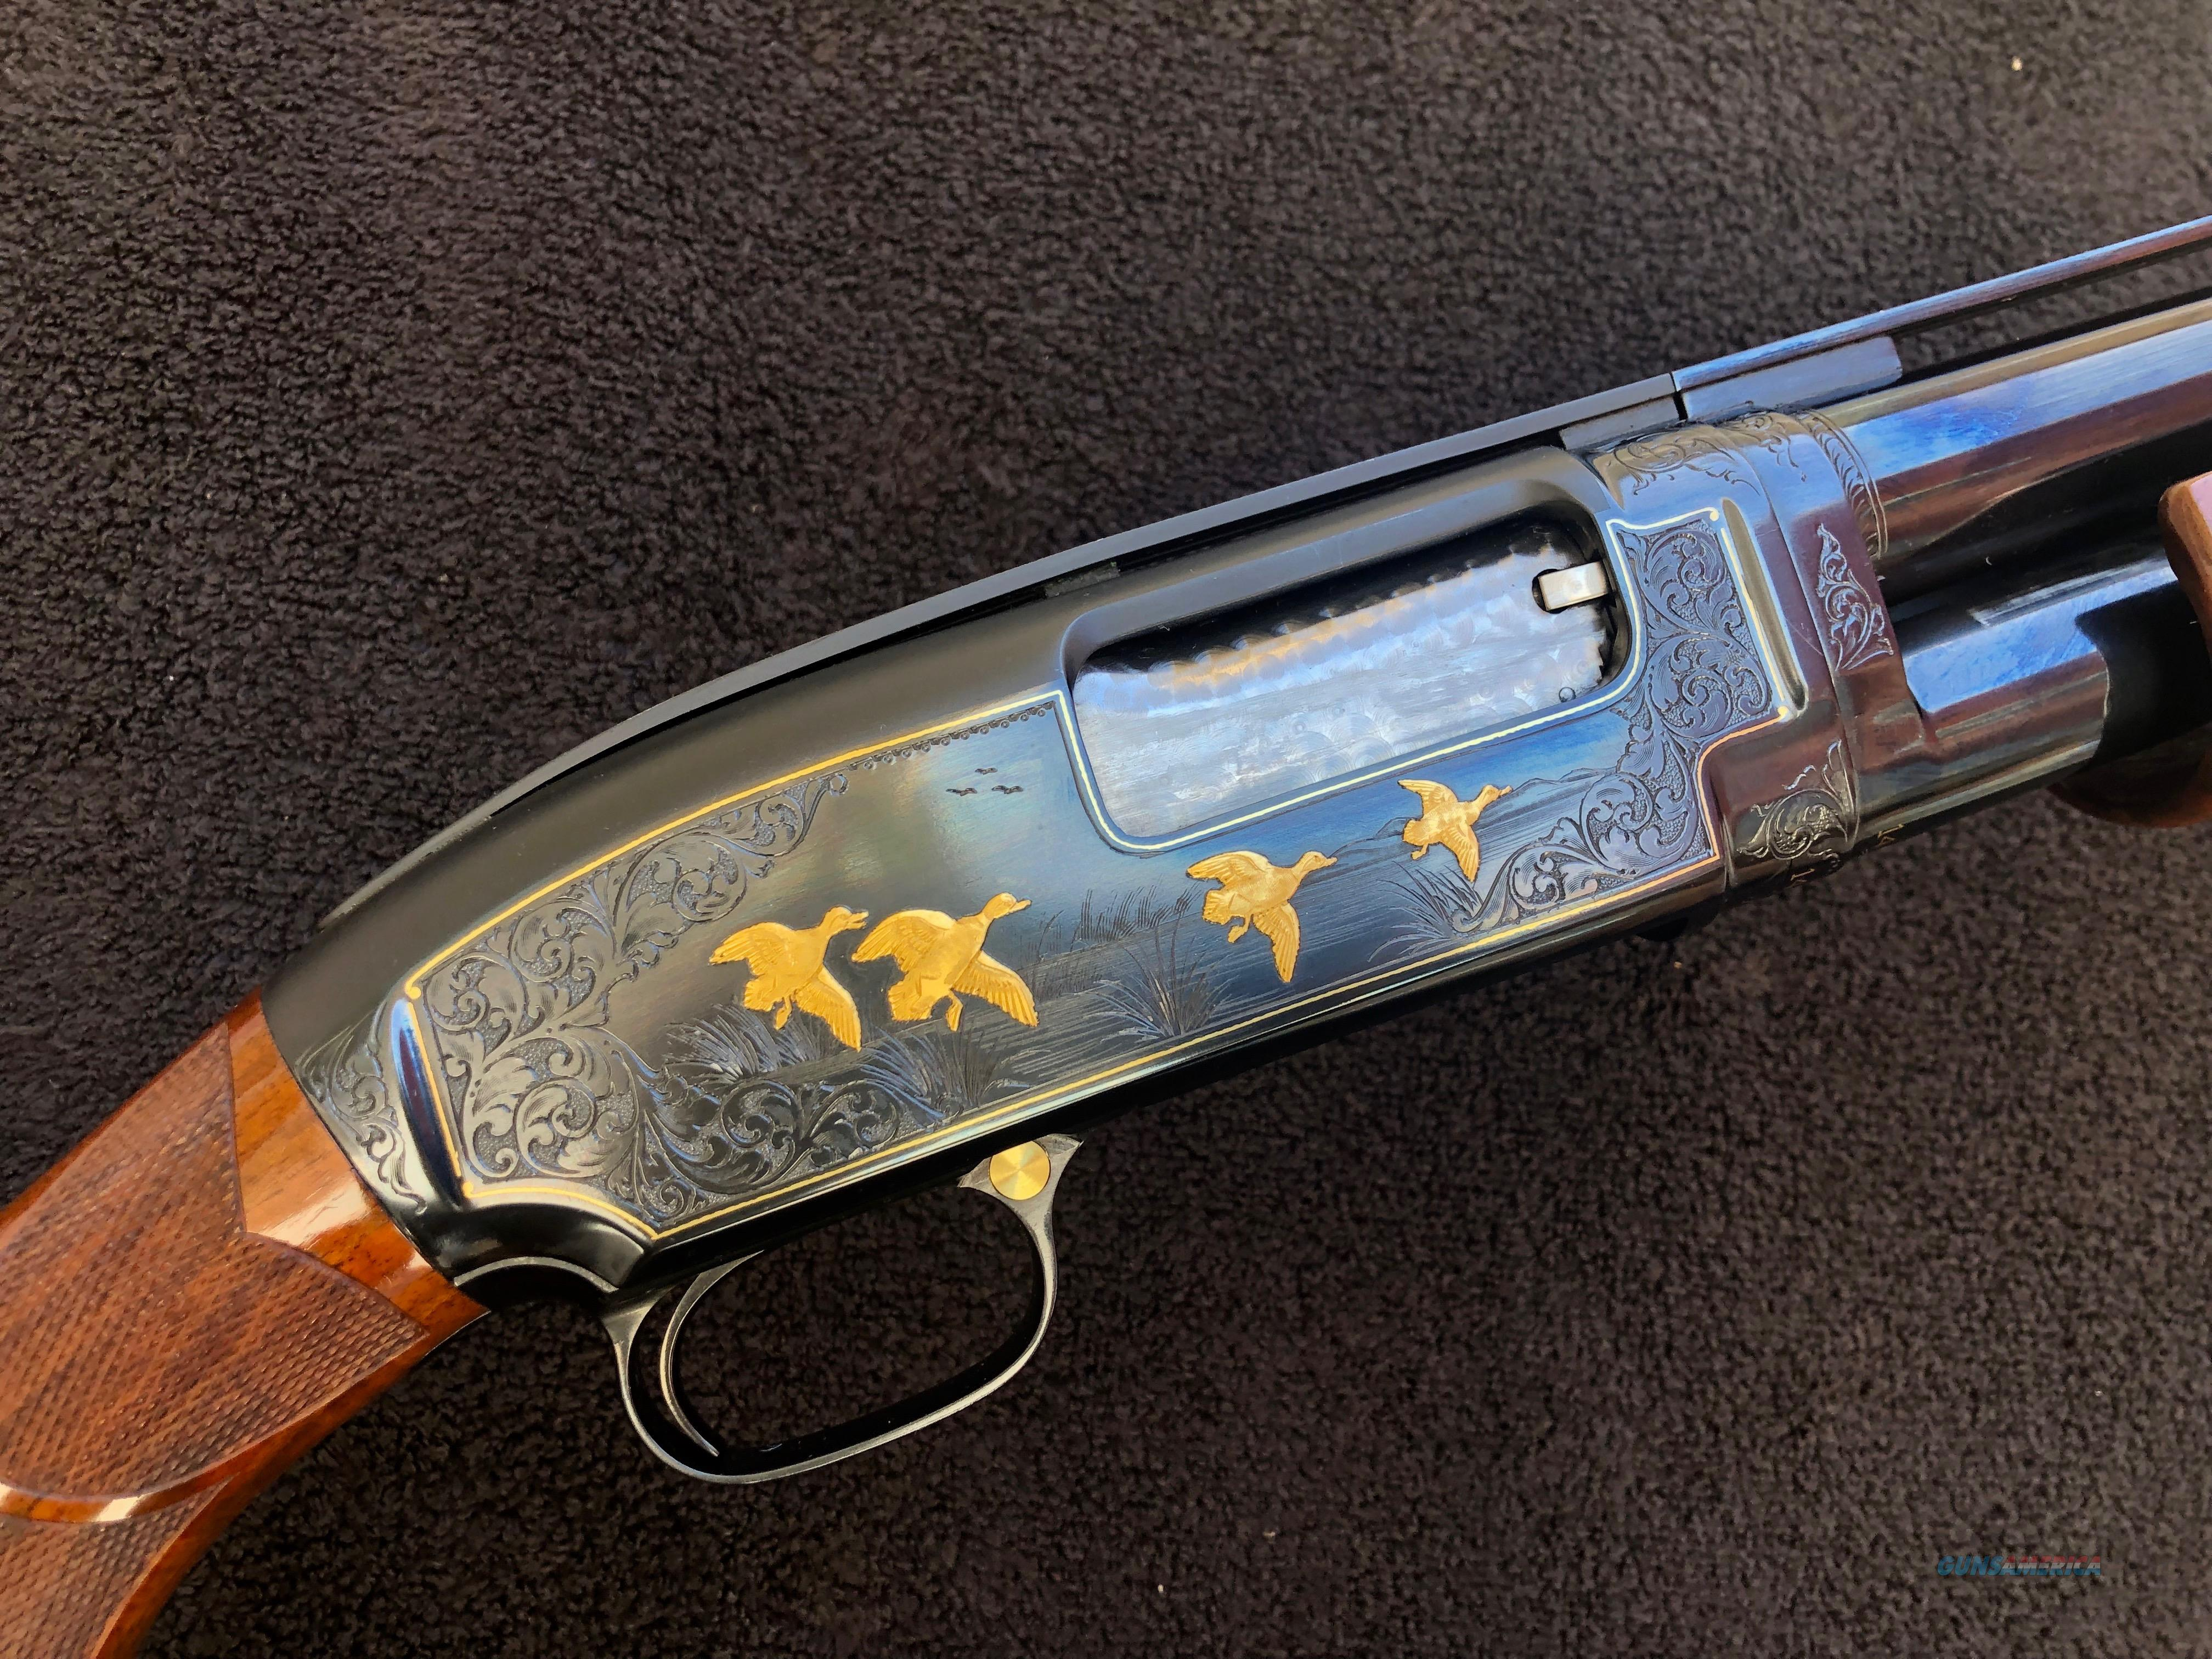 Winchester Model 12 Custom Angelo Bee Engraved  Guns > Shotguns > Winchester Shotguns - Modern > Pump Action > Trap/Skeet